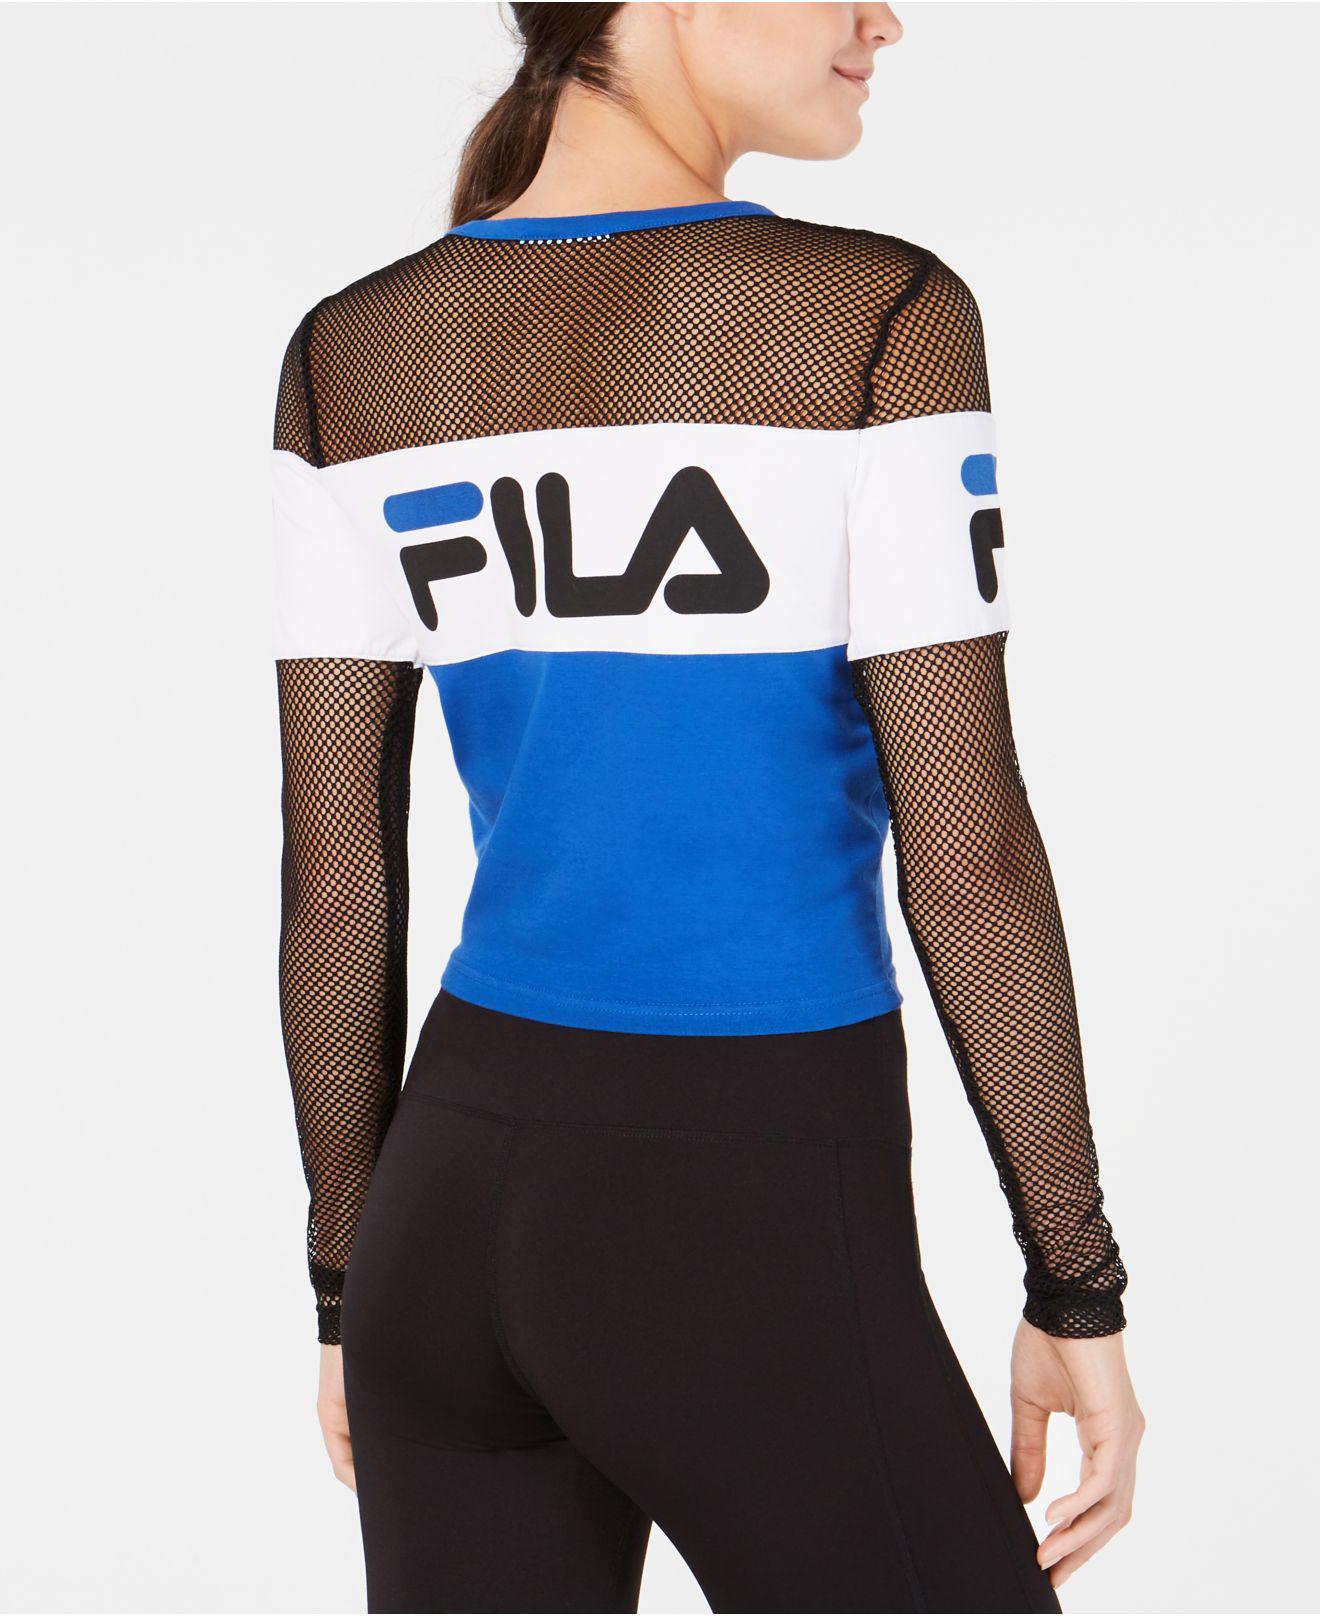 Lyst - Fila Tara Crop Long Sleeve Top in Blue - Save 40.476190476190474% 69507cadd